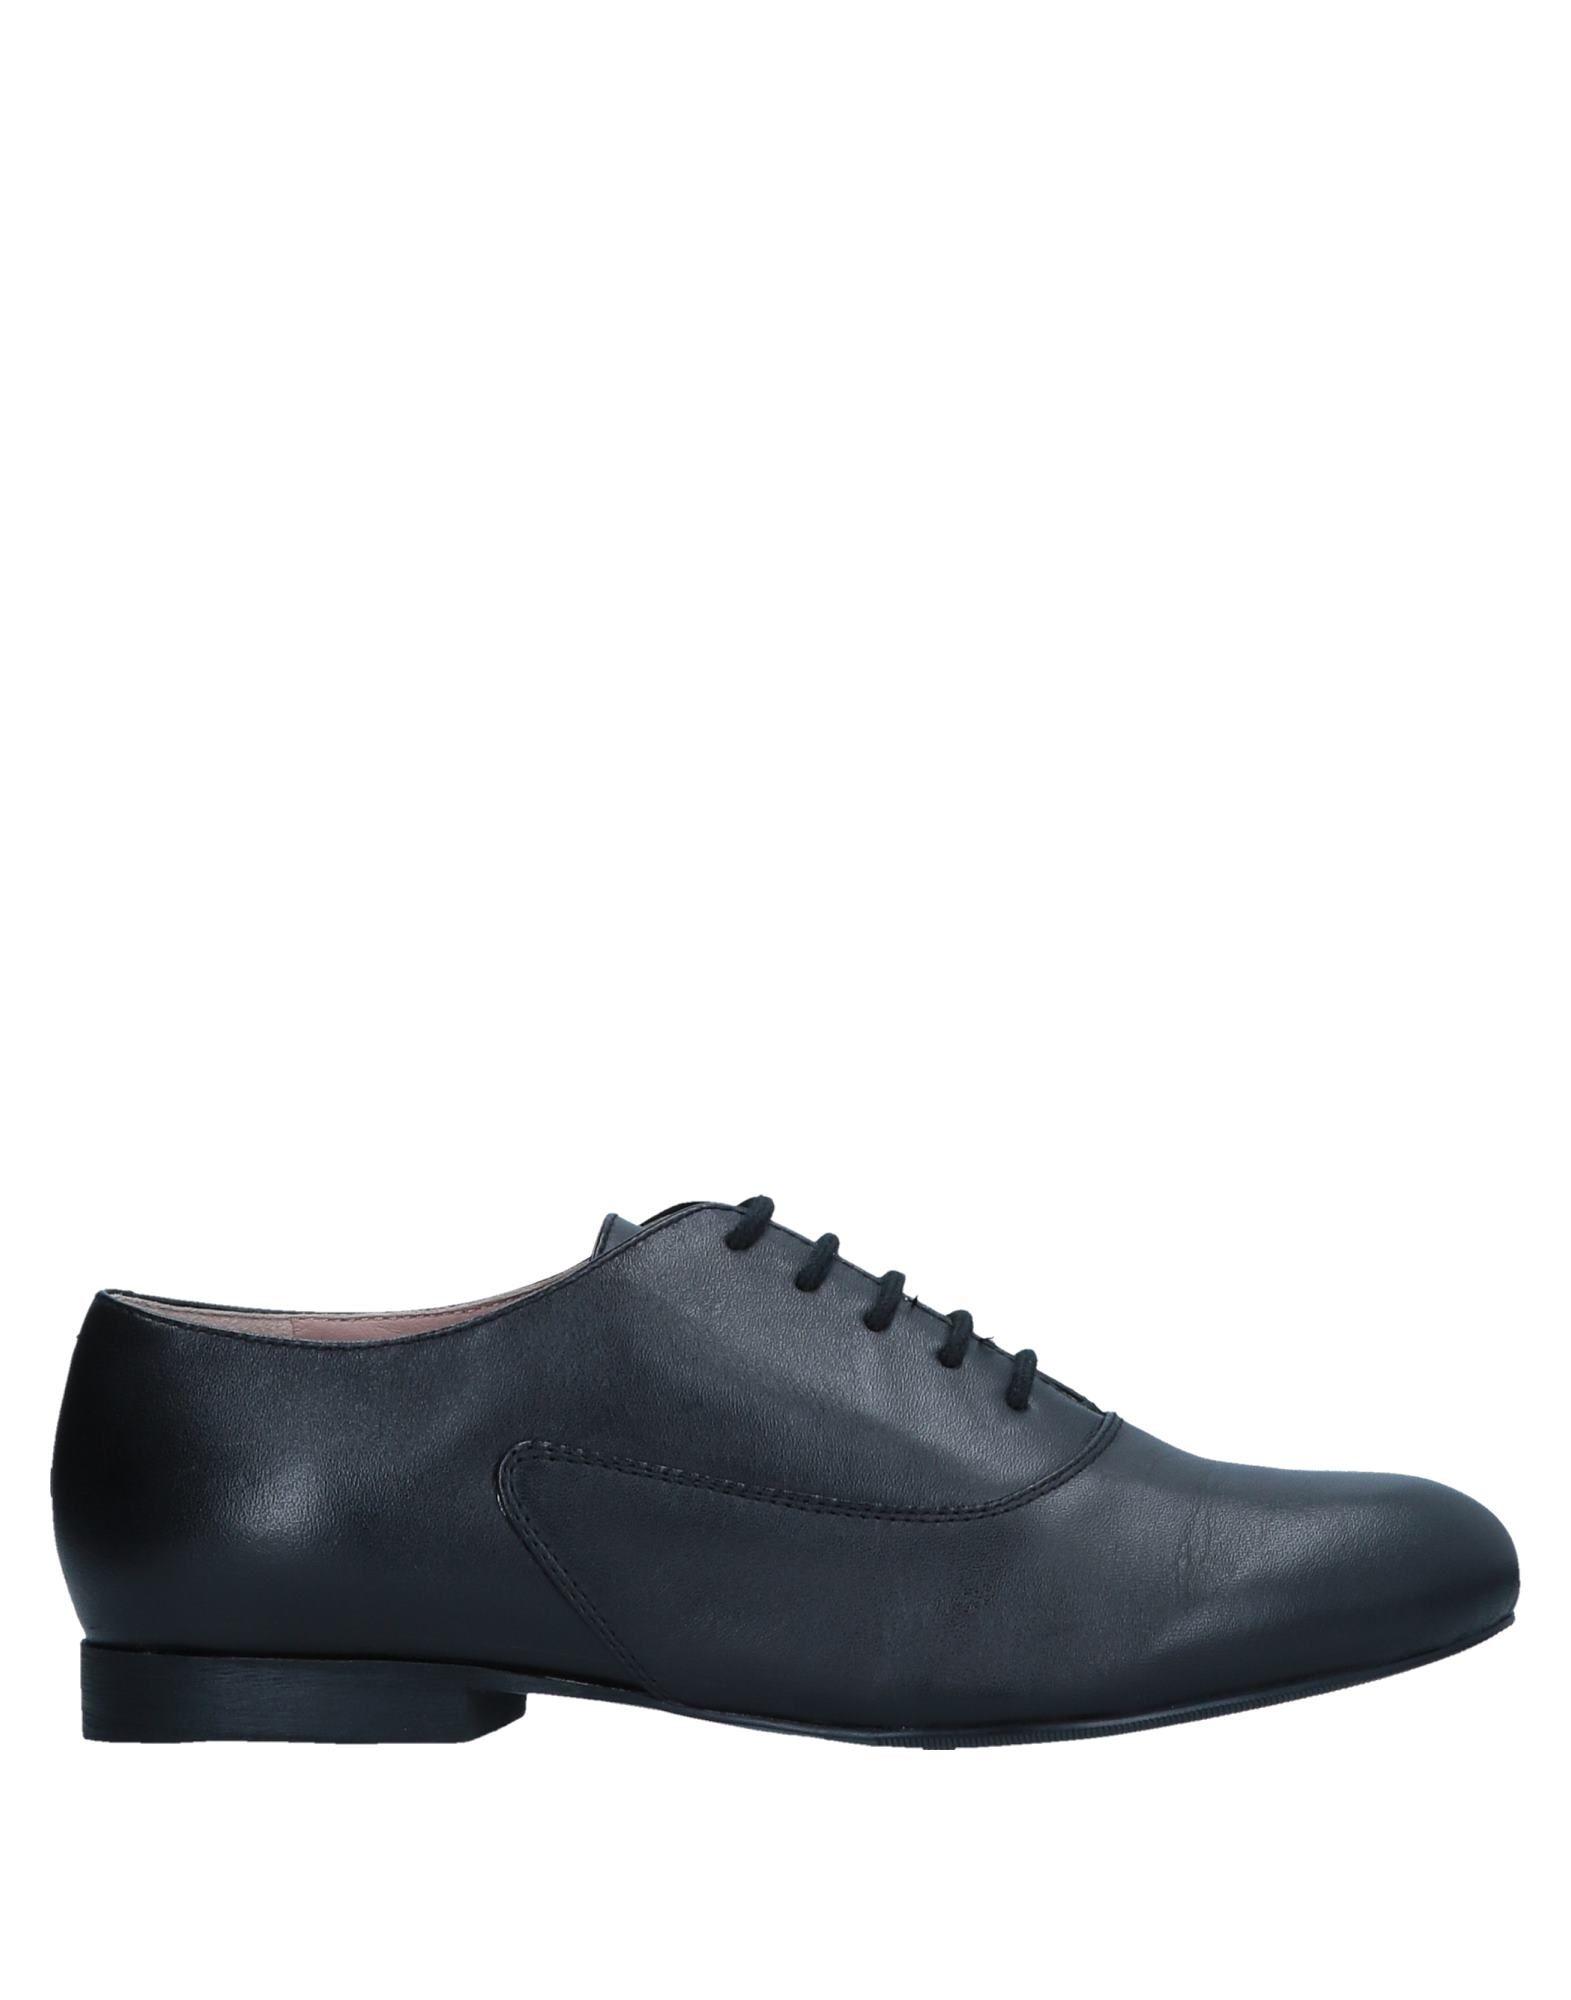 Jil Sander Navy Schnürschuhe Damen  11553290MKGut aussehende strapazierfähige Schuhe